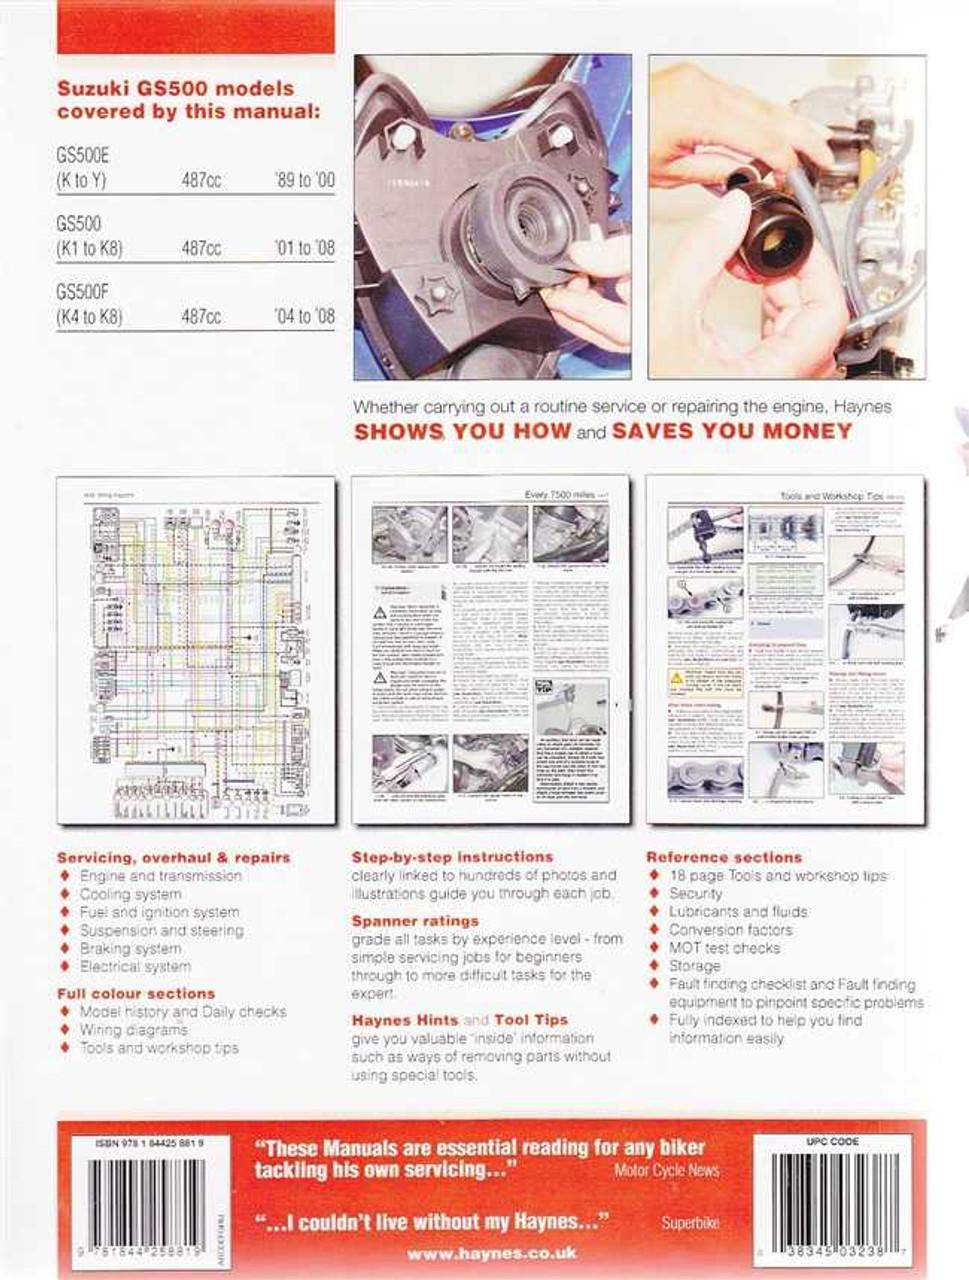 suzuki gs500 gs500e gs500f twin 1989 2008 workshop manual gs500 wiring diagram gs500f wiring diagram [ 969 x 1280 Pixel ]